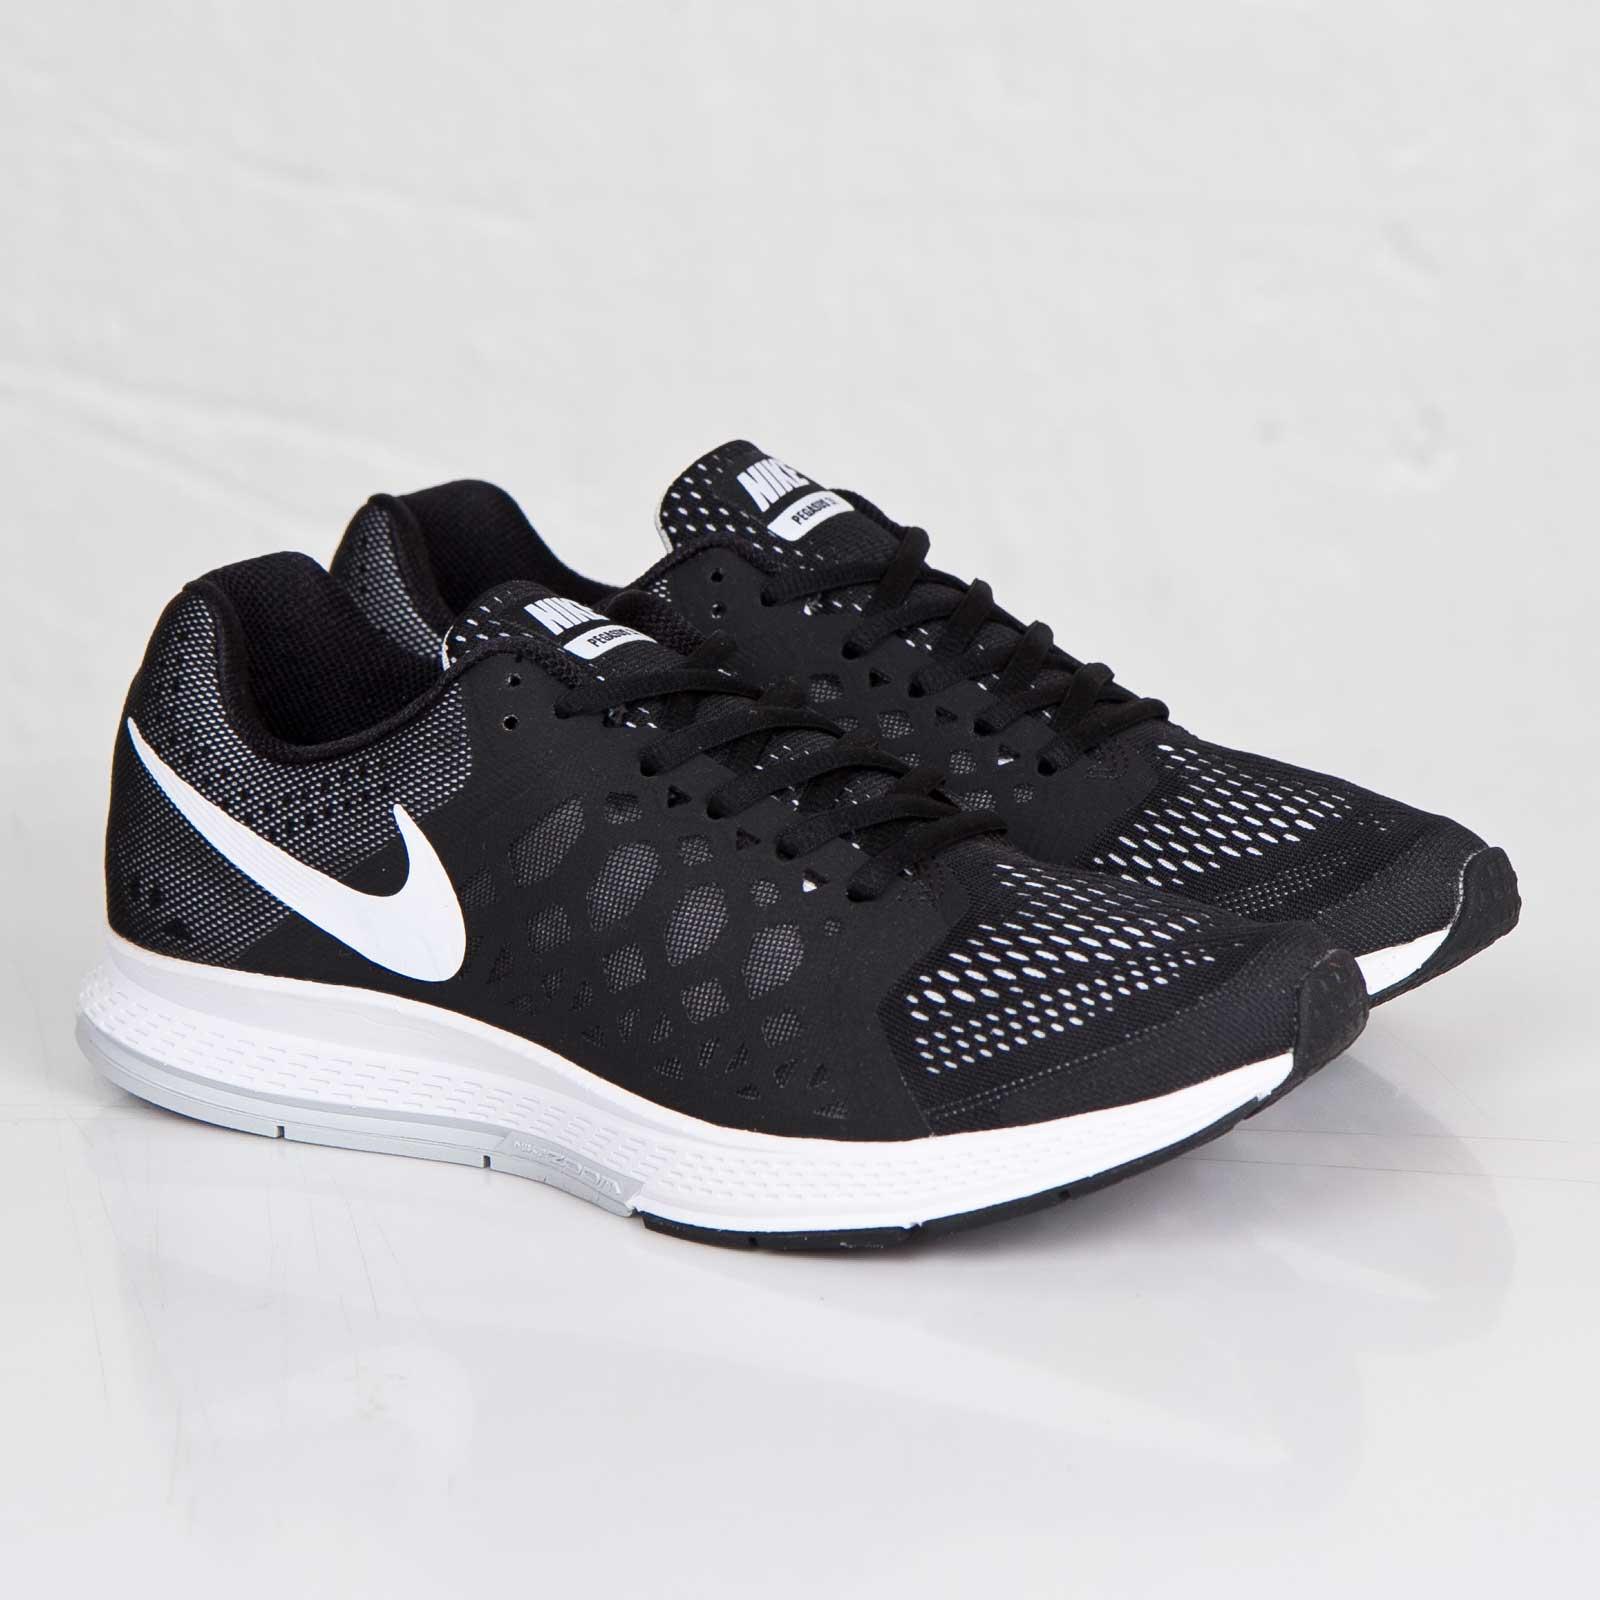 d575ac89ab4 Nike Air Zoom Pegasus 31 - 652925-010 - Sneakersnstuff